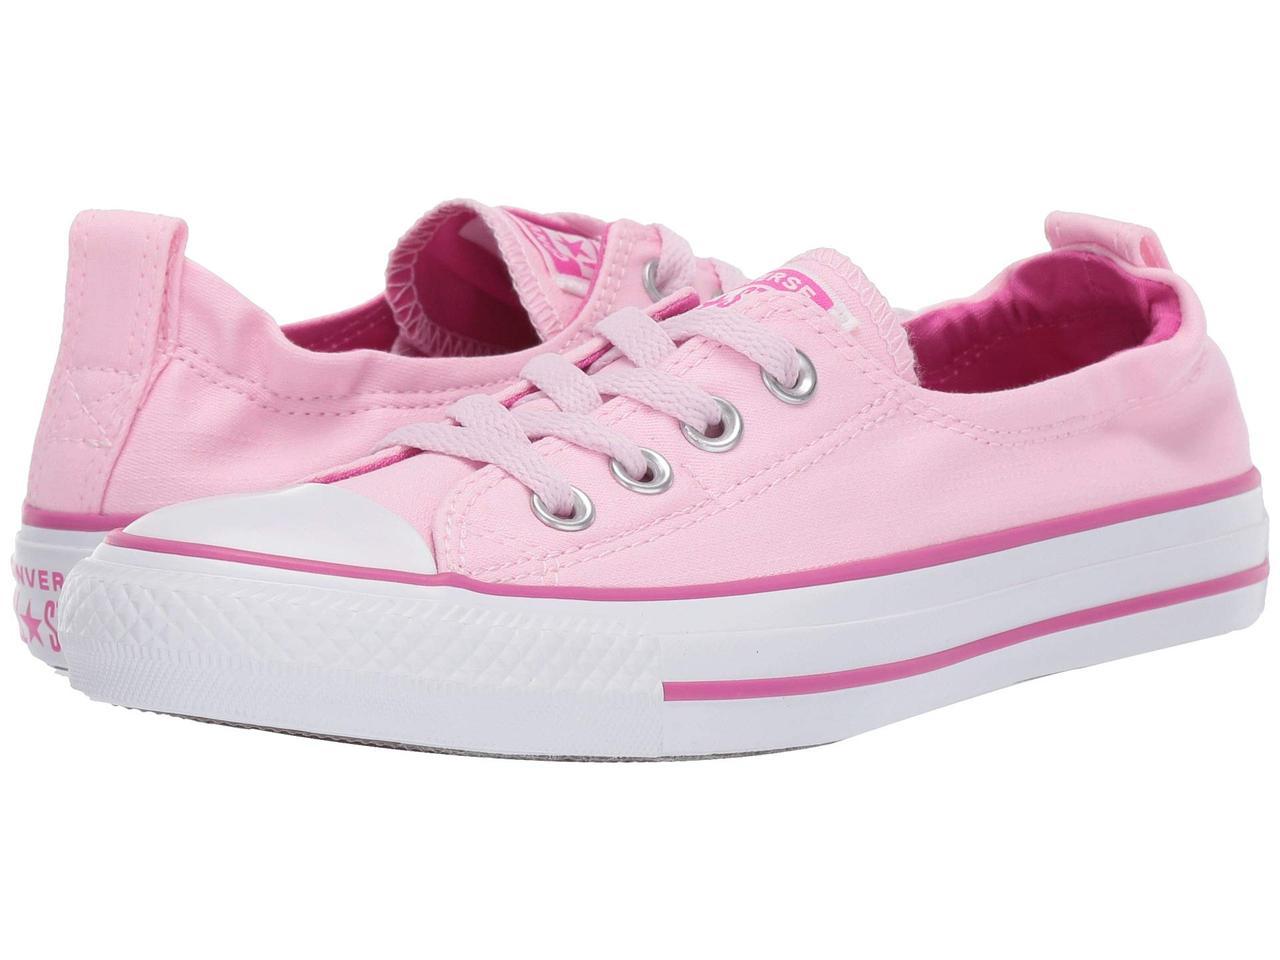 0cf66978852 Кроссовки Кеды (Оригинал) Converse Chuck Taylor® All Star® Shoreline  Slip-On Pink Foam Active Fuchsia White